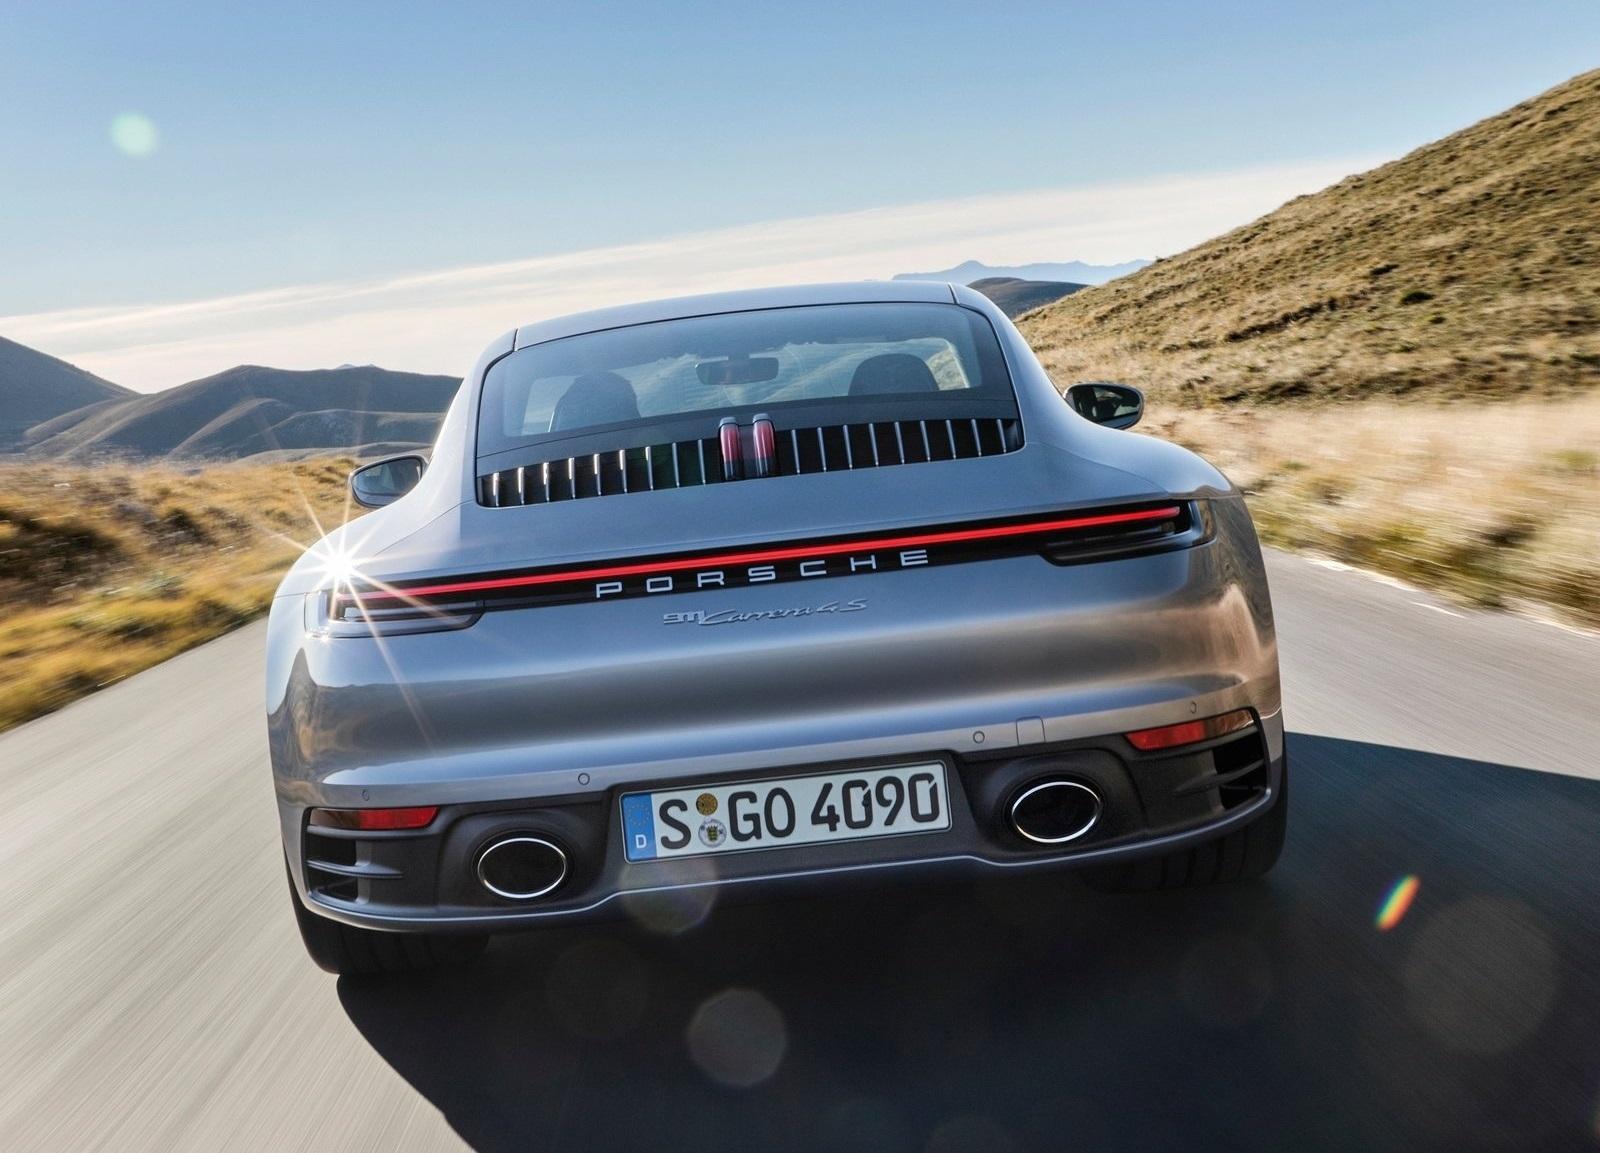 Porsche 911 Carrera 4s 2019 Trasera